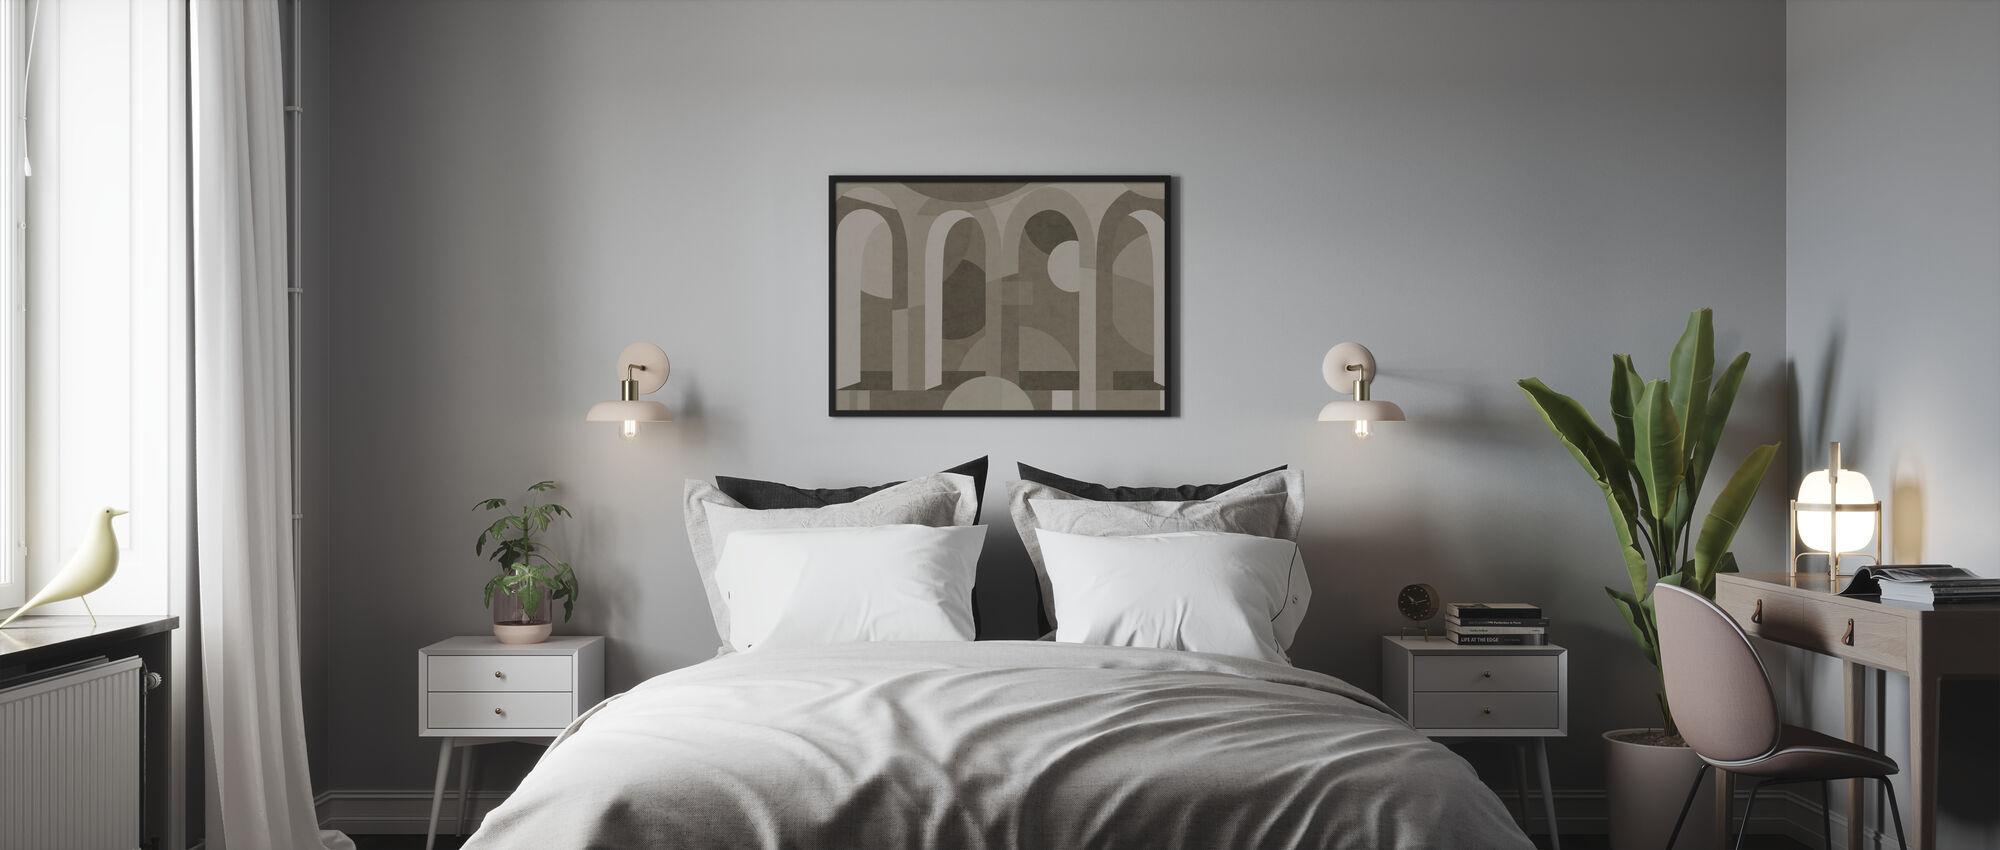 Archform - Shades of Brown - Framed print - Bedroom